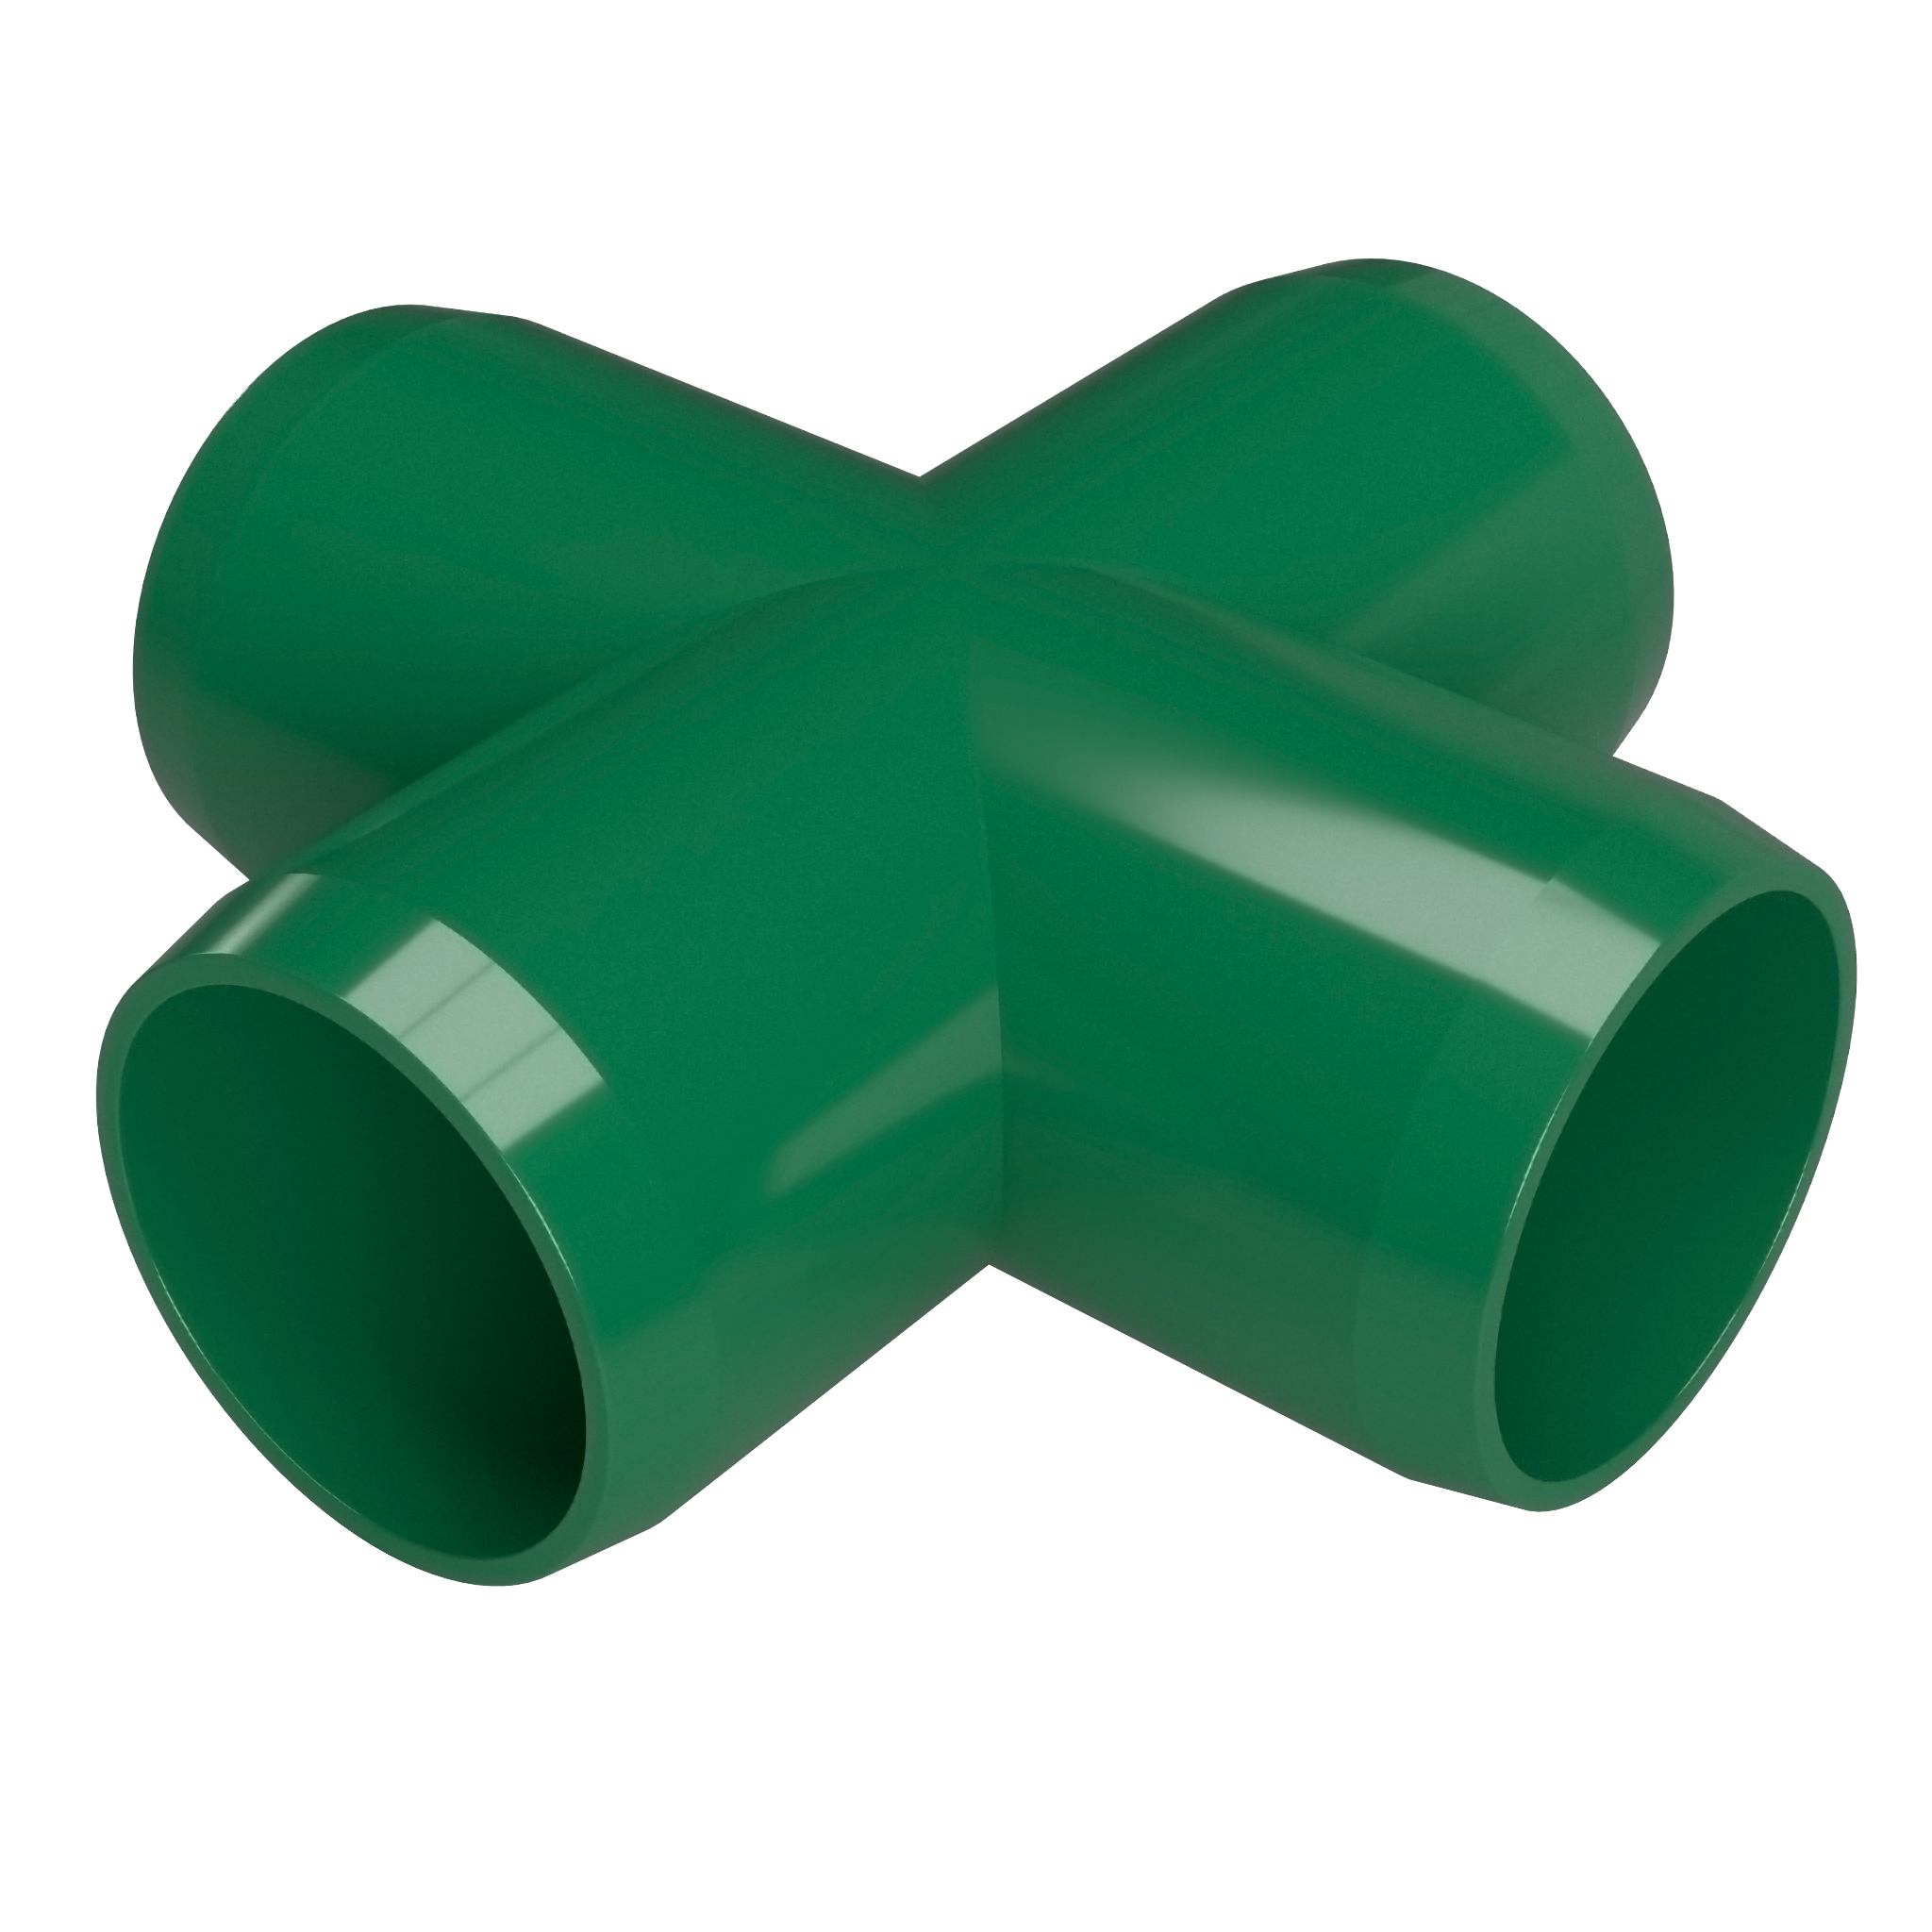 "FORMUFIT F001CRX-GR-4 Cross PVC Fitting, Furniture Grade, 1"" Size, Green, 4-Pack"